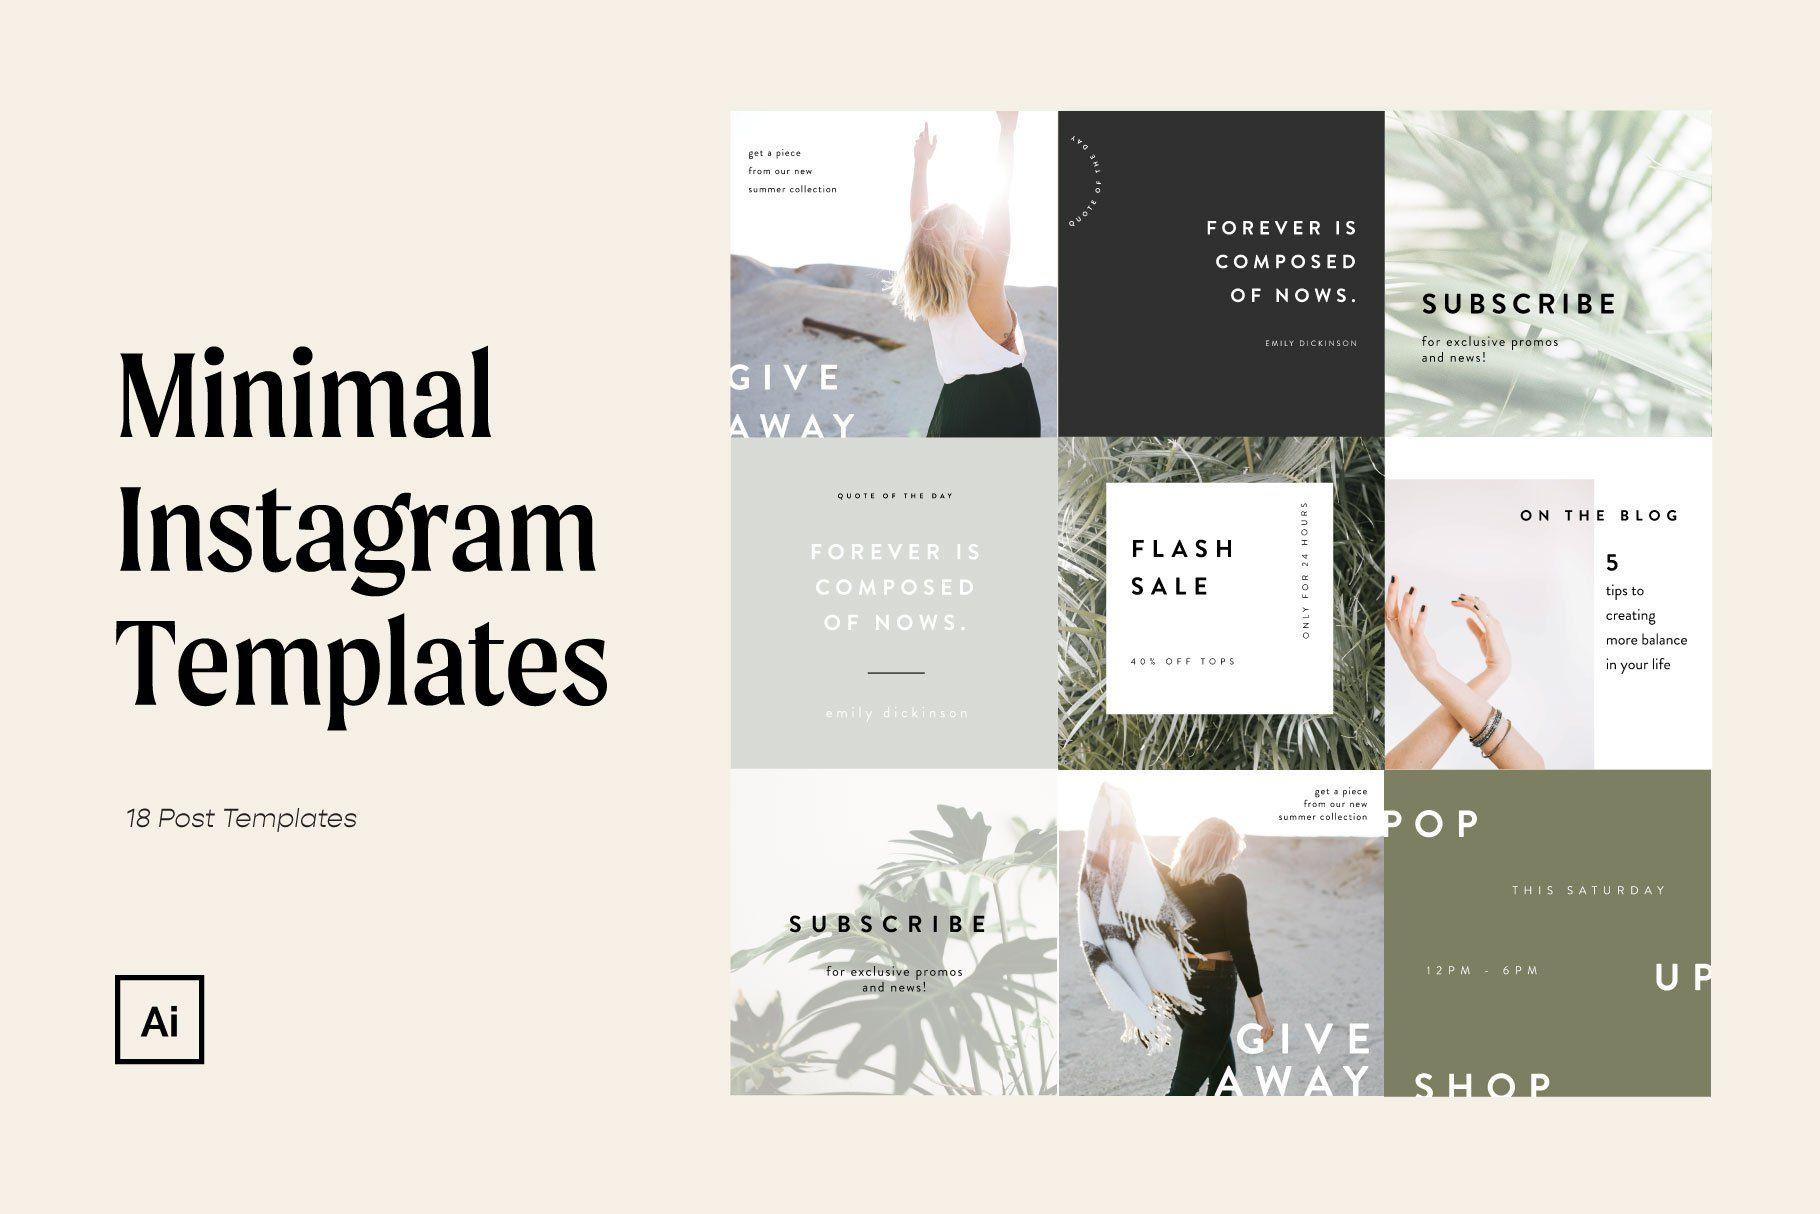 18 customizable Instagram templates for e-commerce...